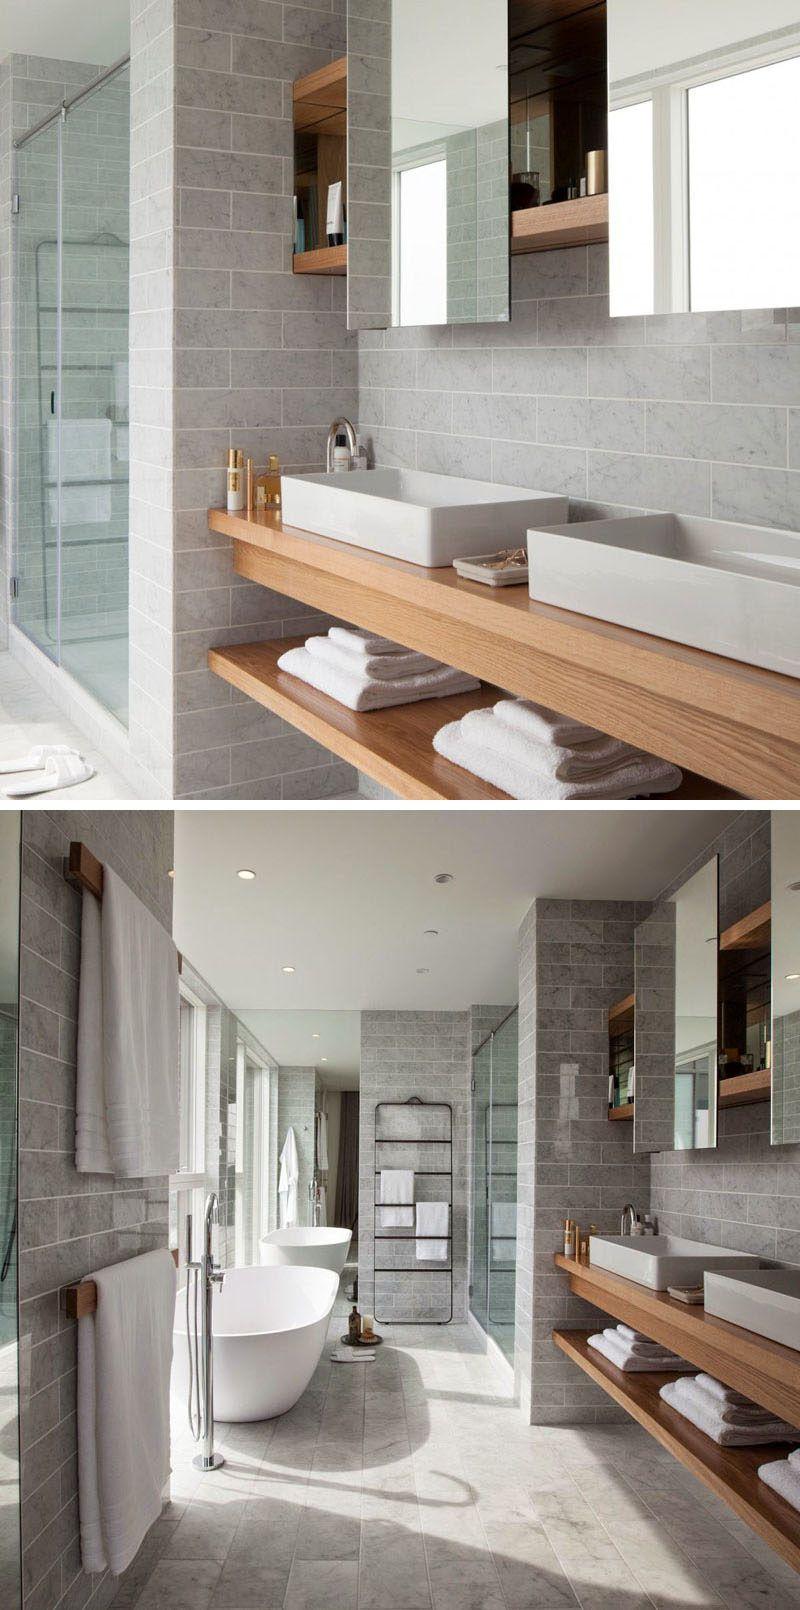 Photo of 15 Examples Of Bathroom Vanities That Have Open Shelving